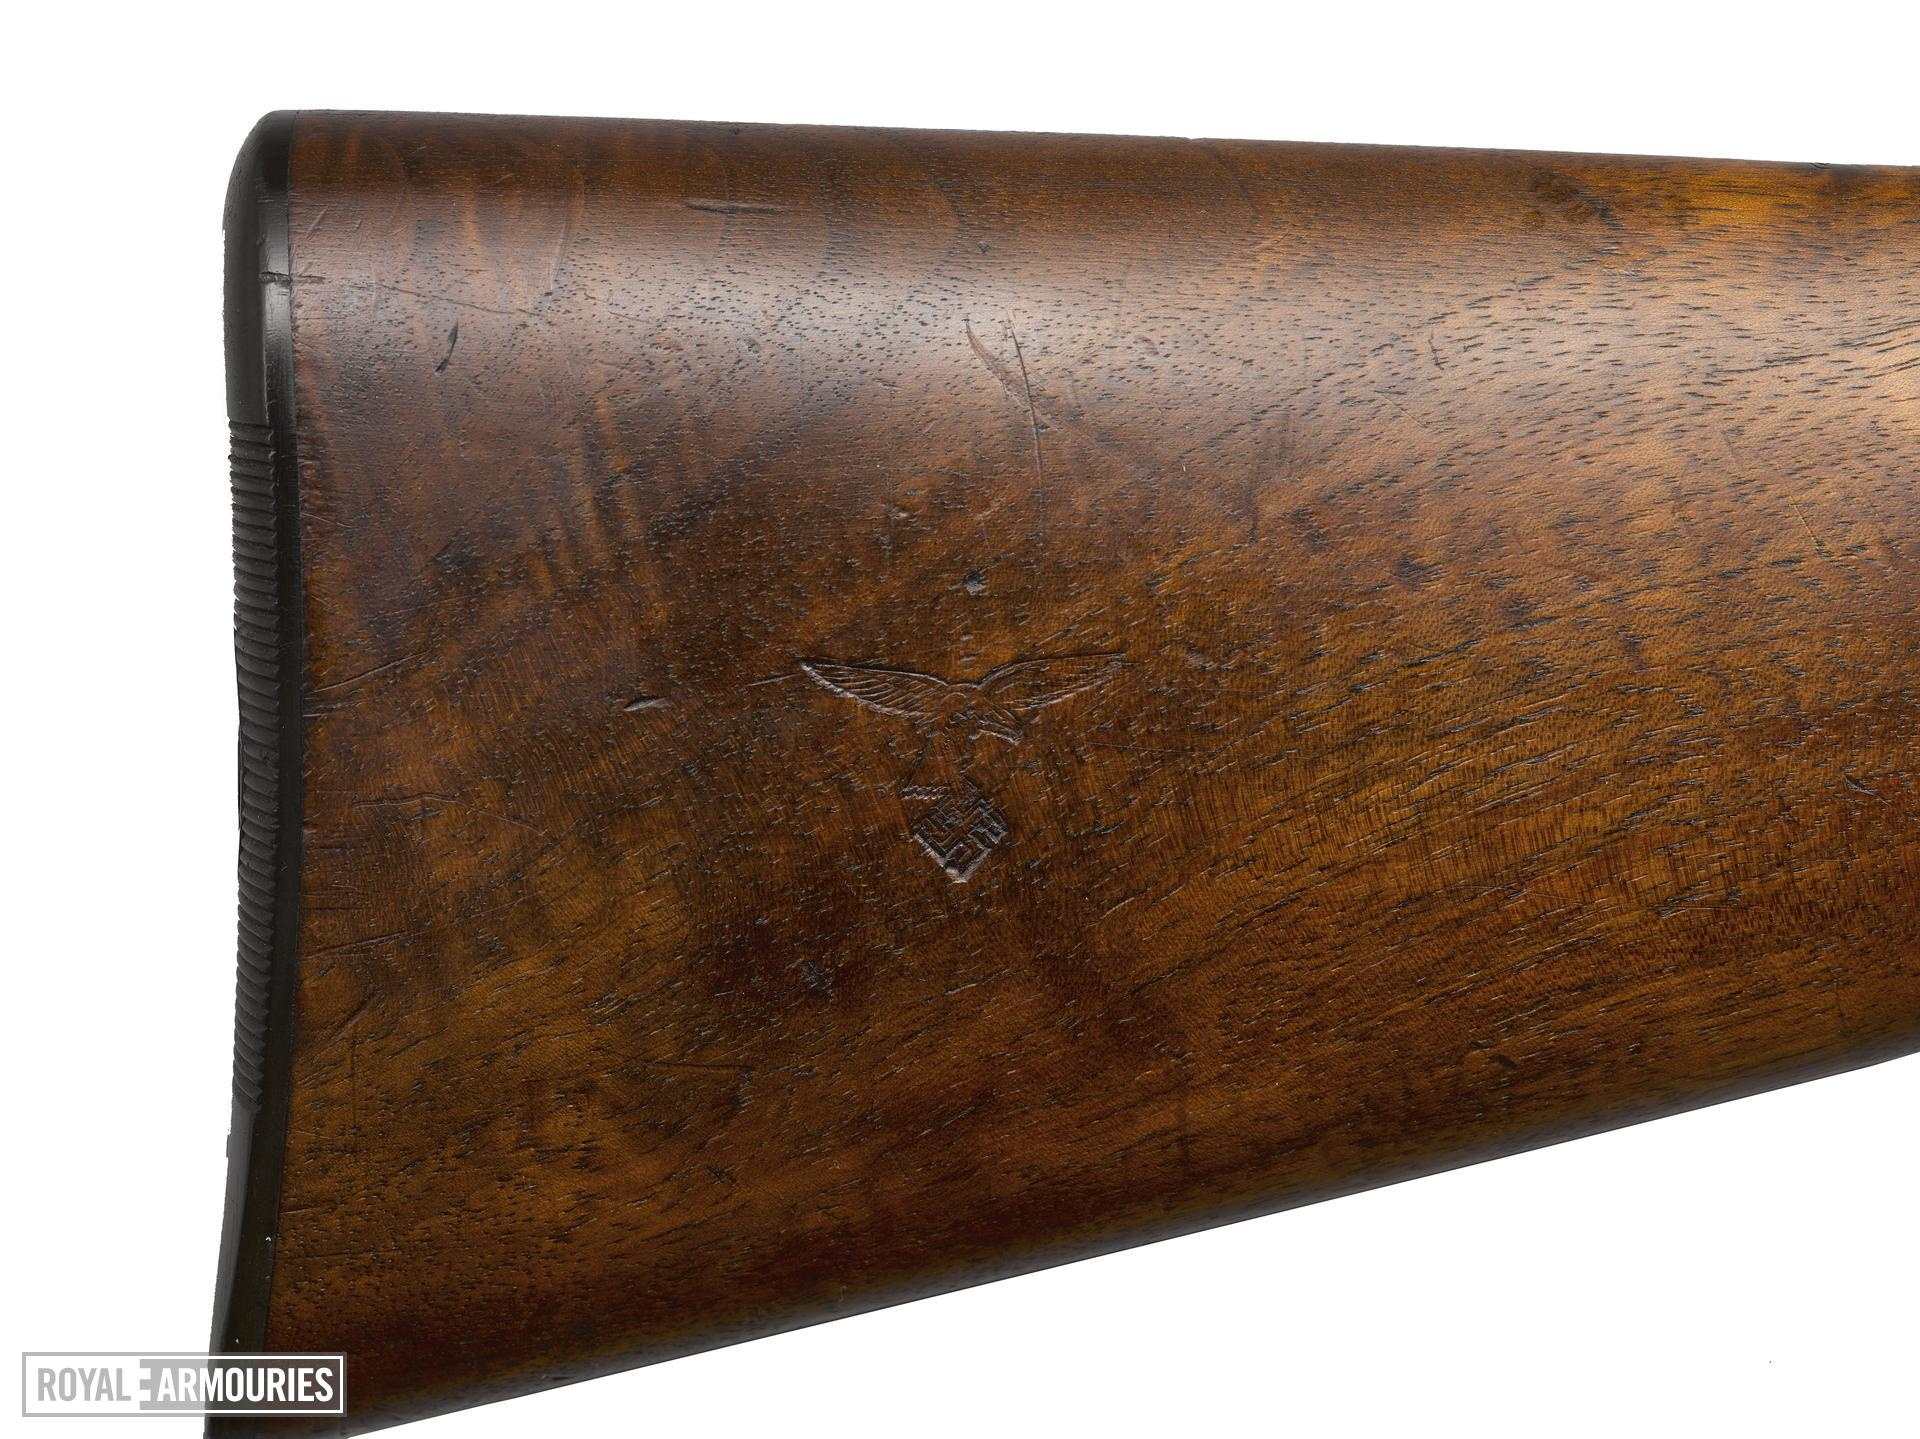 Centrefire breech-loading triple-barrelled combination rifle and shotgun - Drilling, Sauer M30 Luftwaffe issue survival drilling